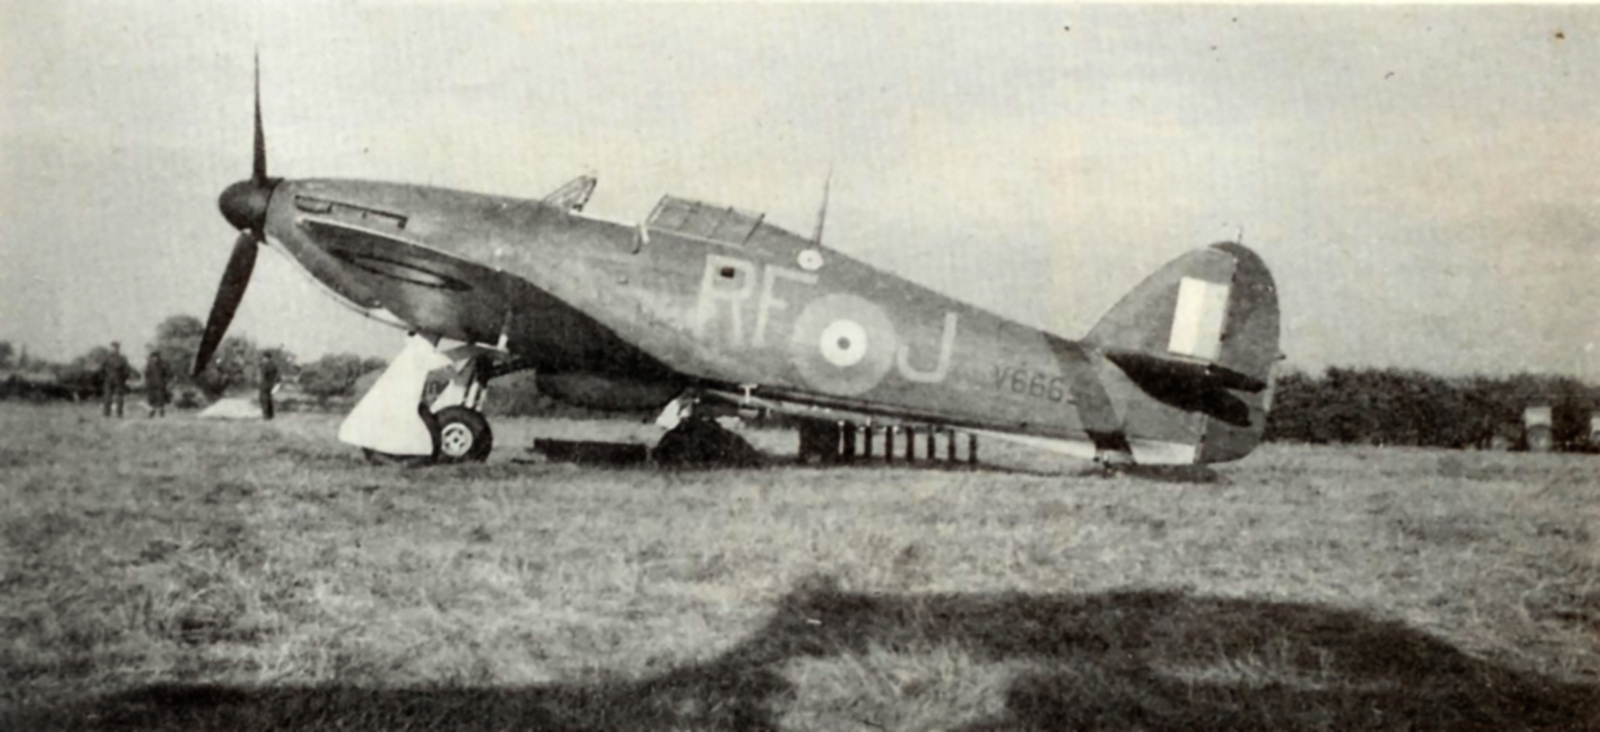 Hurricane I RAF 303Sqn RFJ John A Kent V6665 Northolt England Sep 1940 01